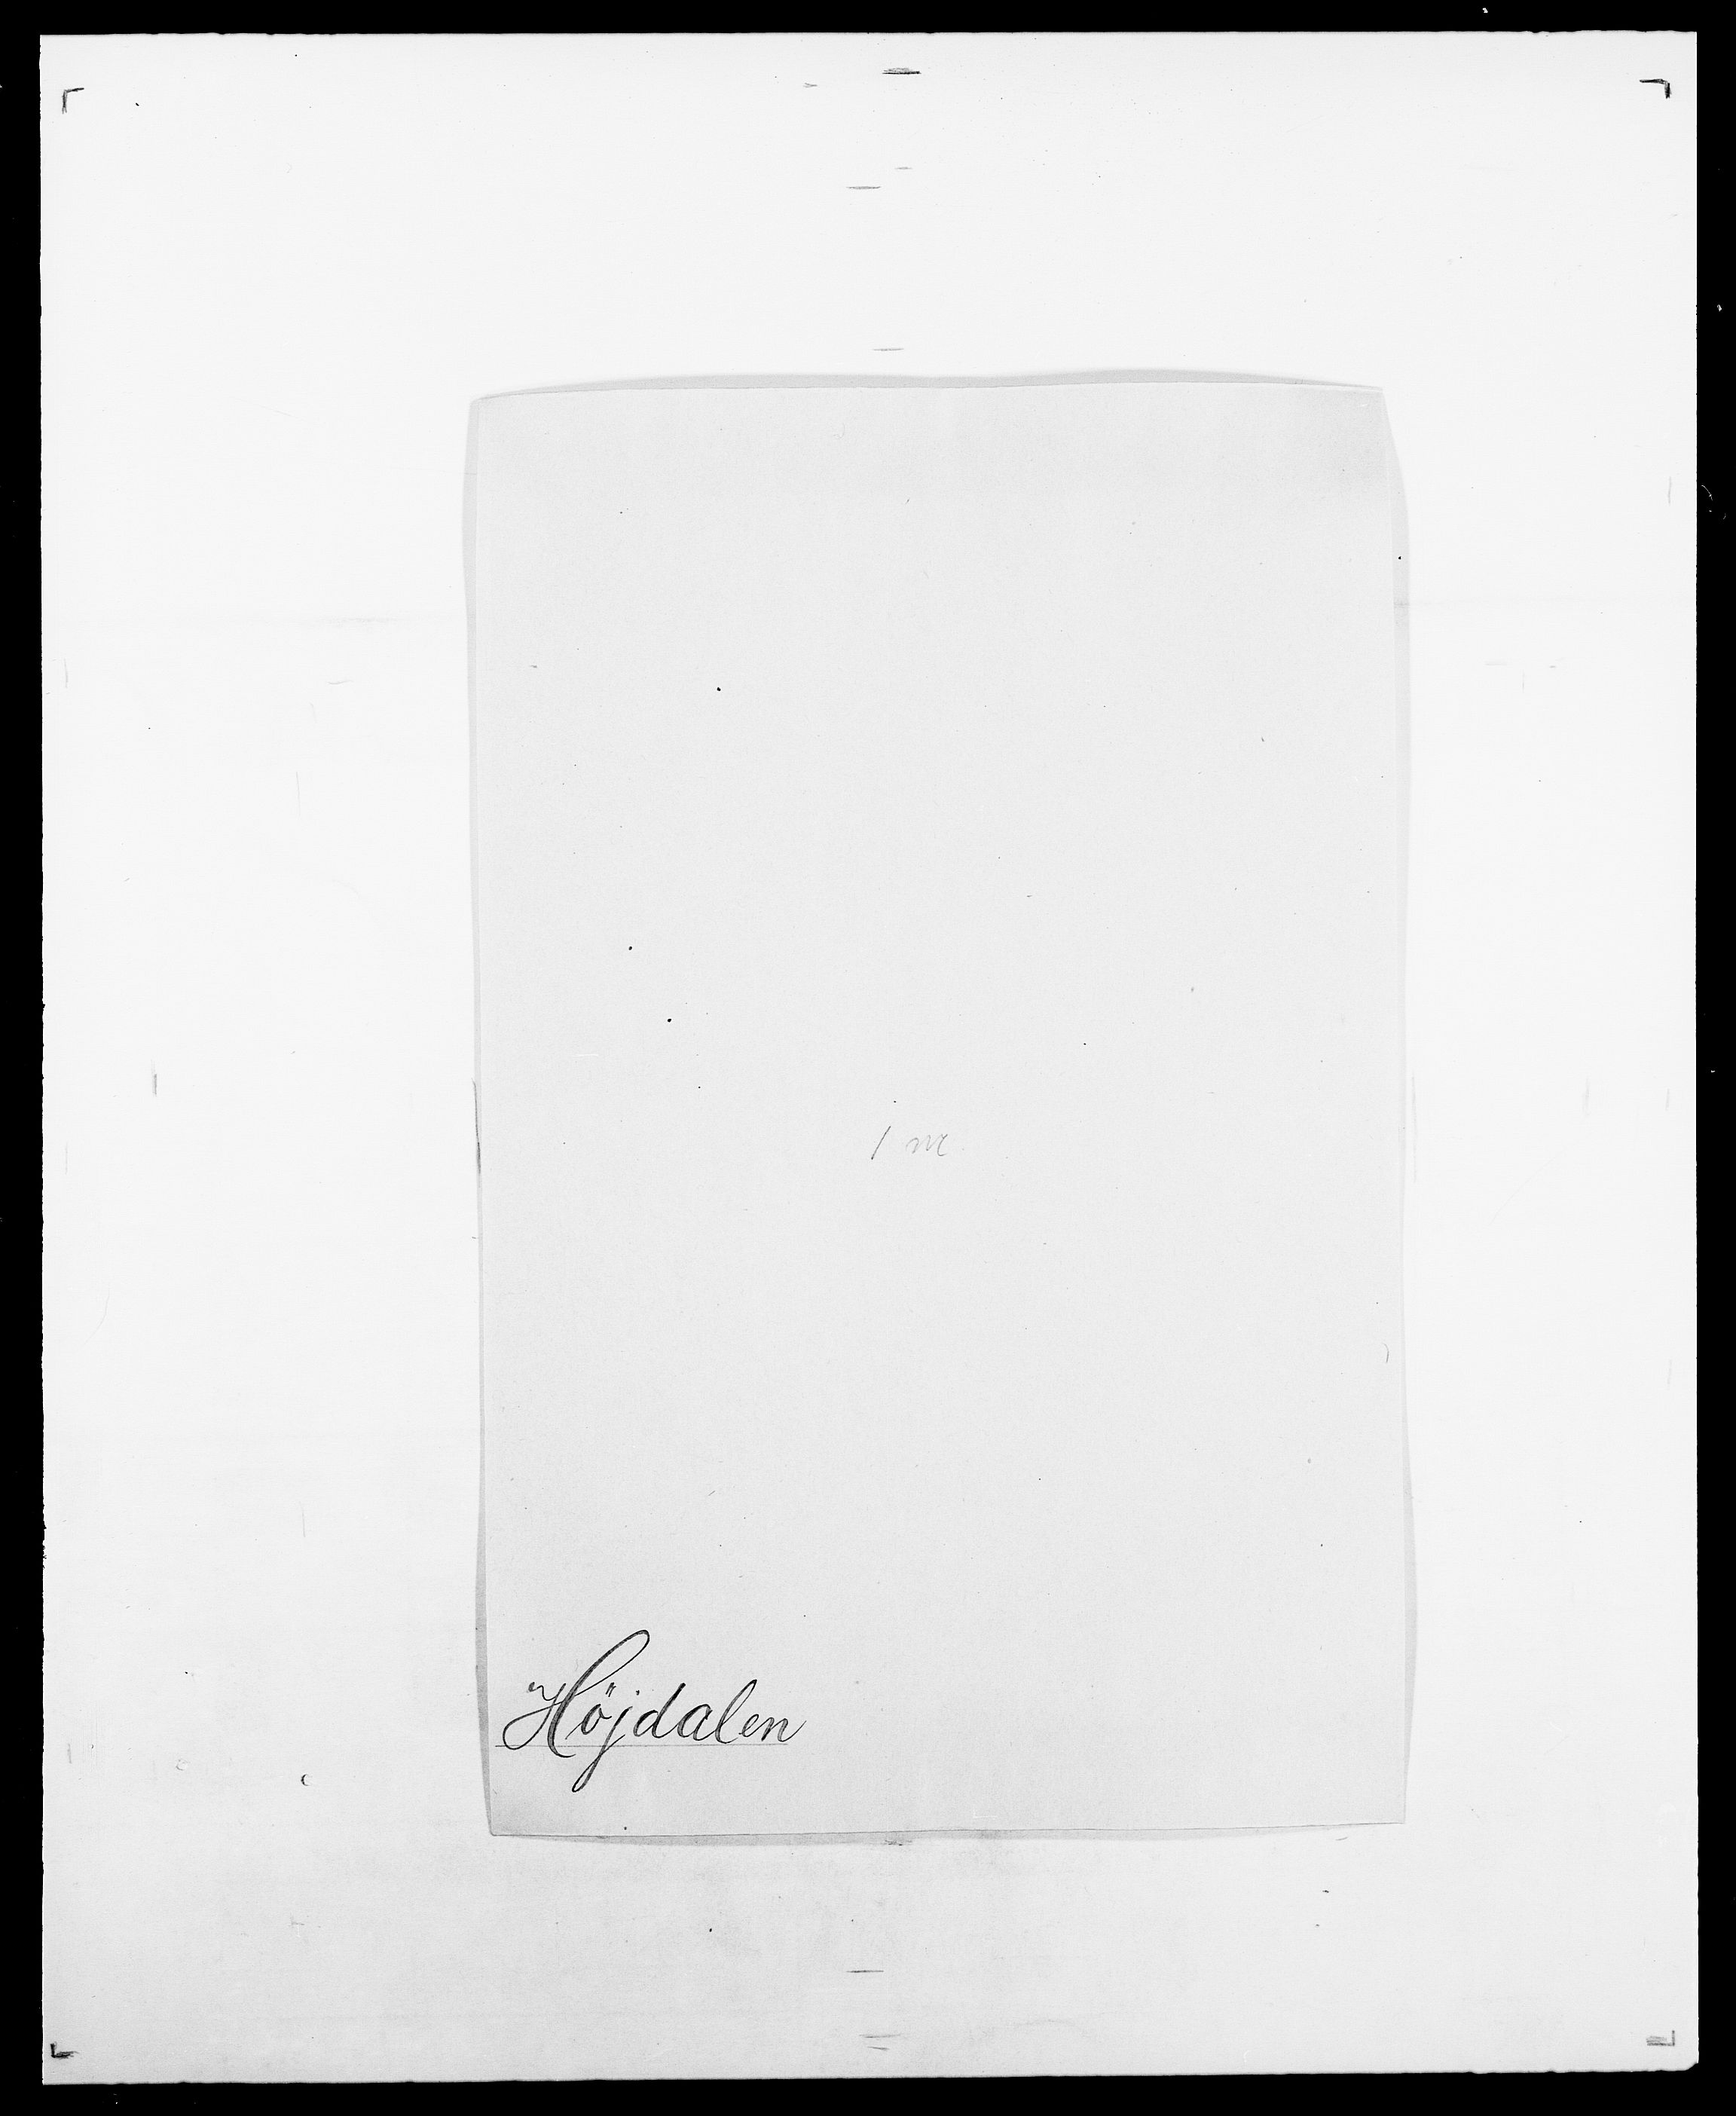 SAO, Delgobe, Charles Antoine - samling, D/Da/L0019: van der Hude - Joys, s. 354